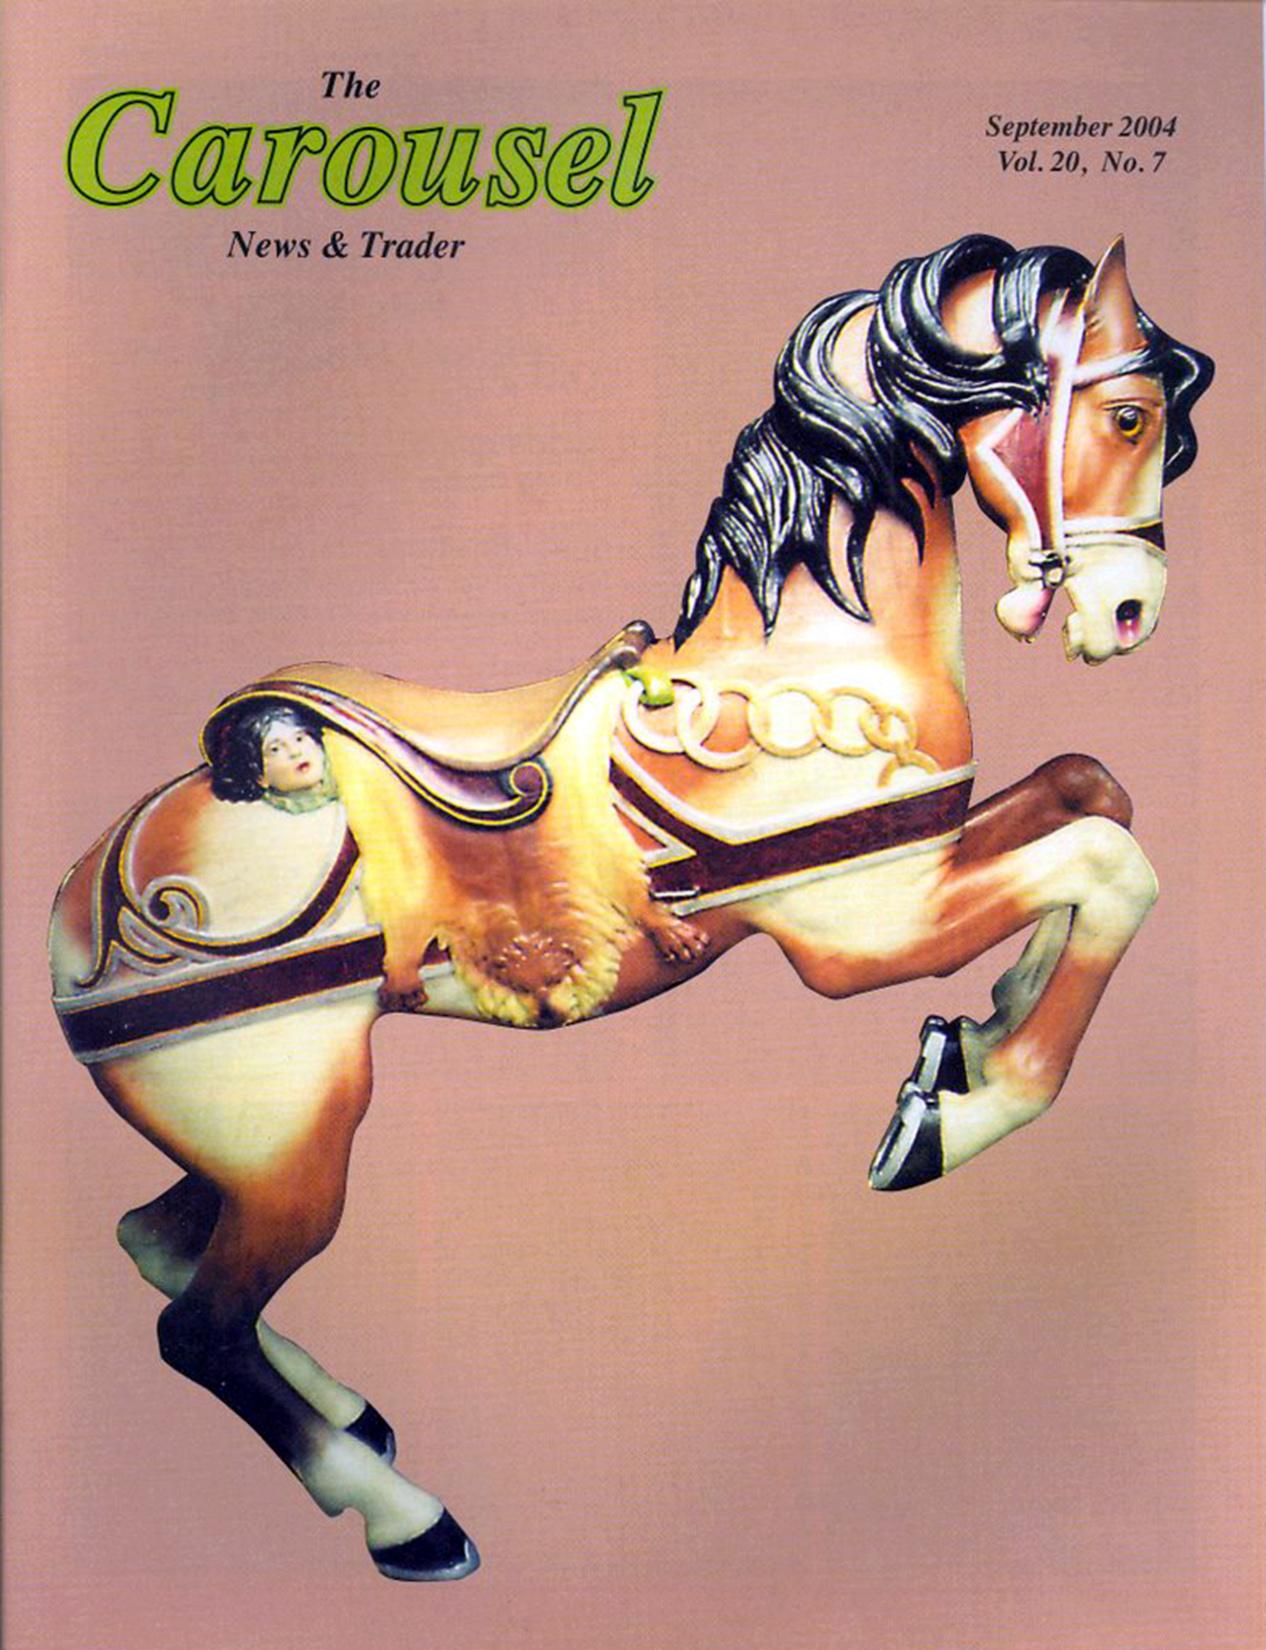 cnt_09_2004-Muller-pelt-saddle-carousel-horse-Lisa-Parr-restored